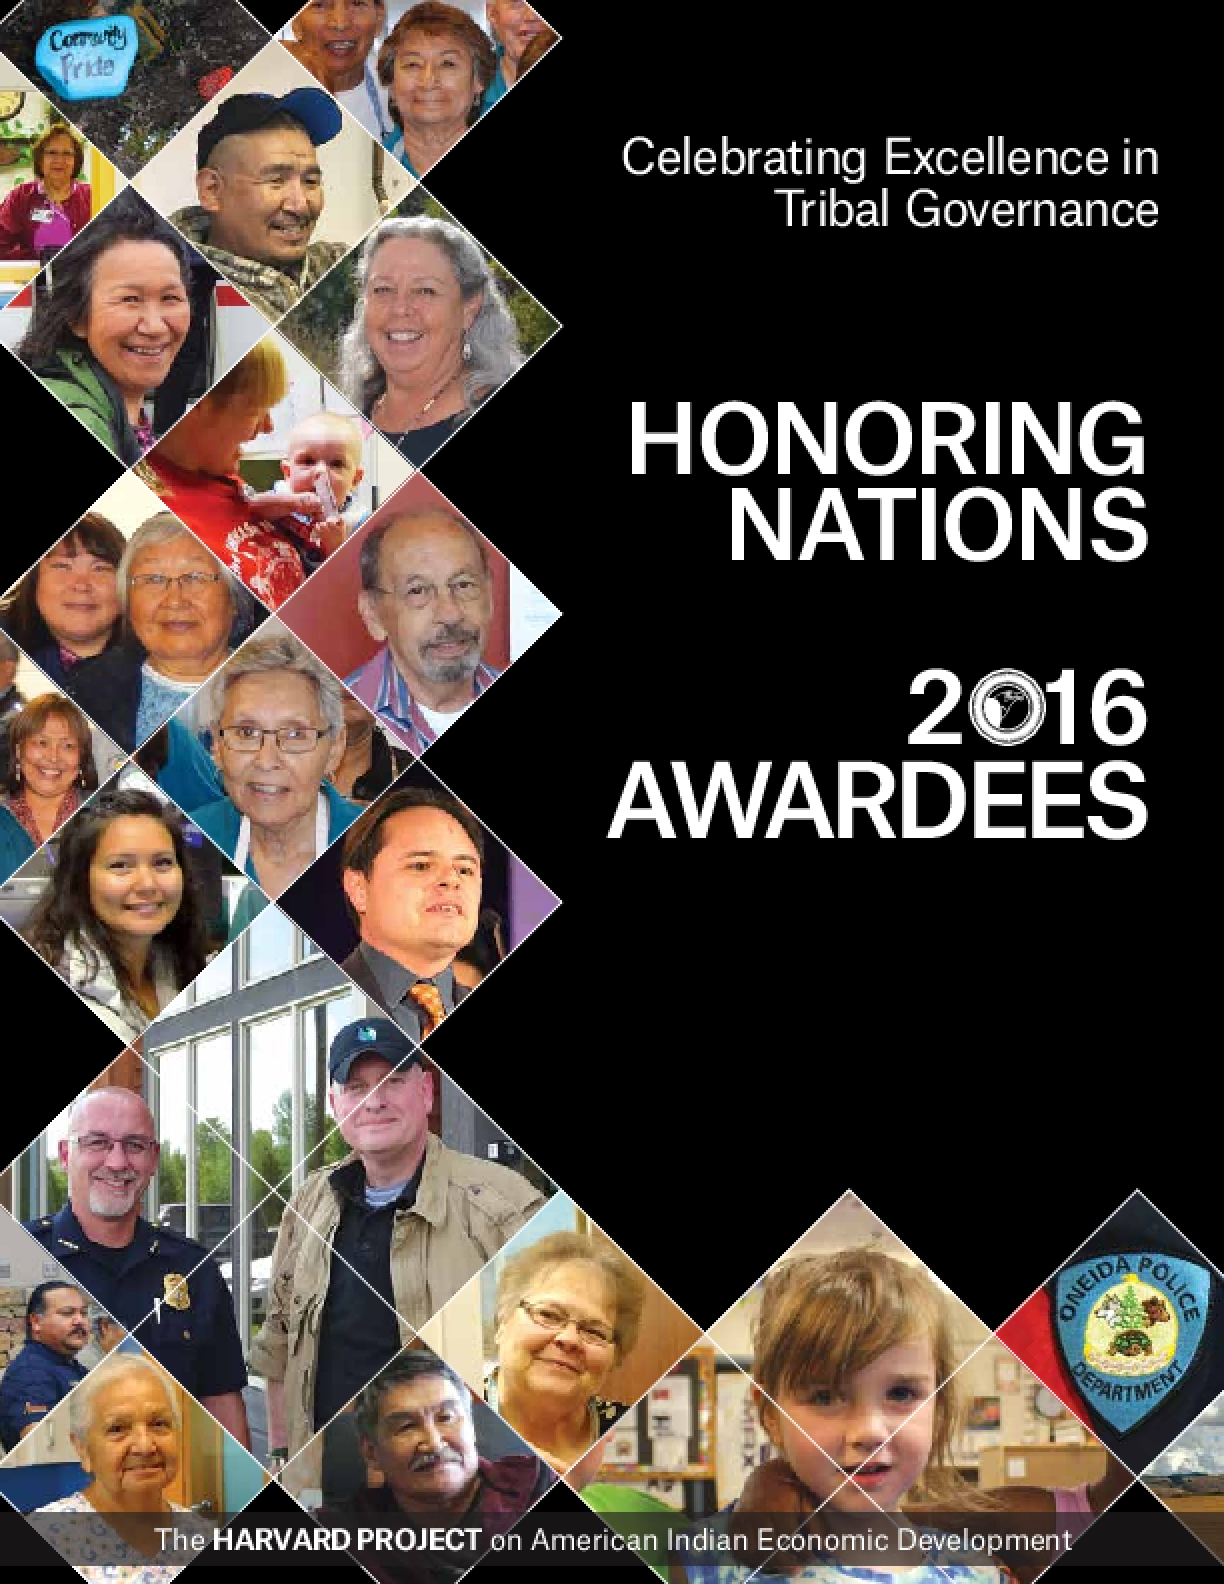 Celebrating Excellence in Tribal Governance